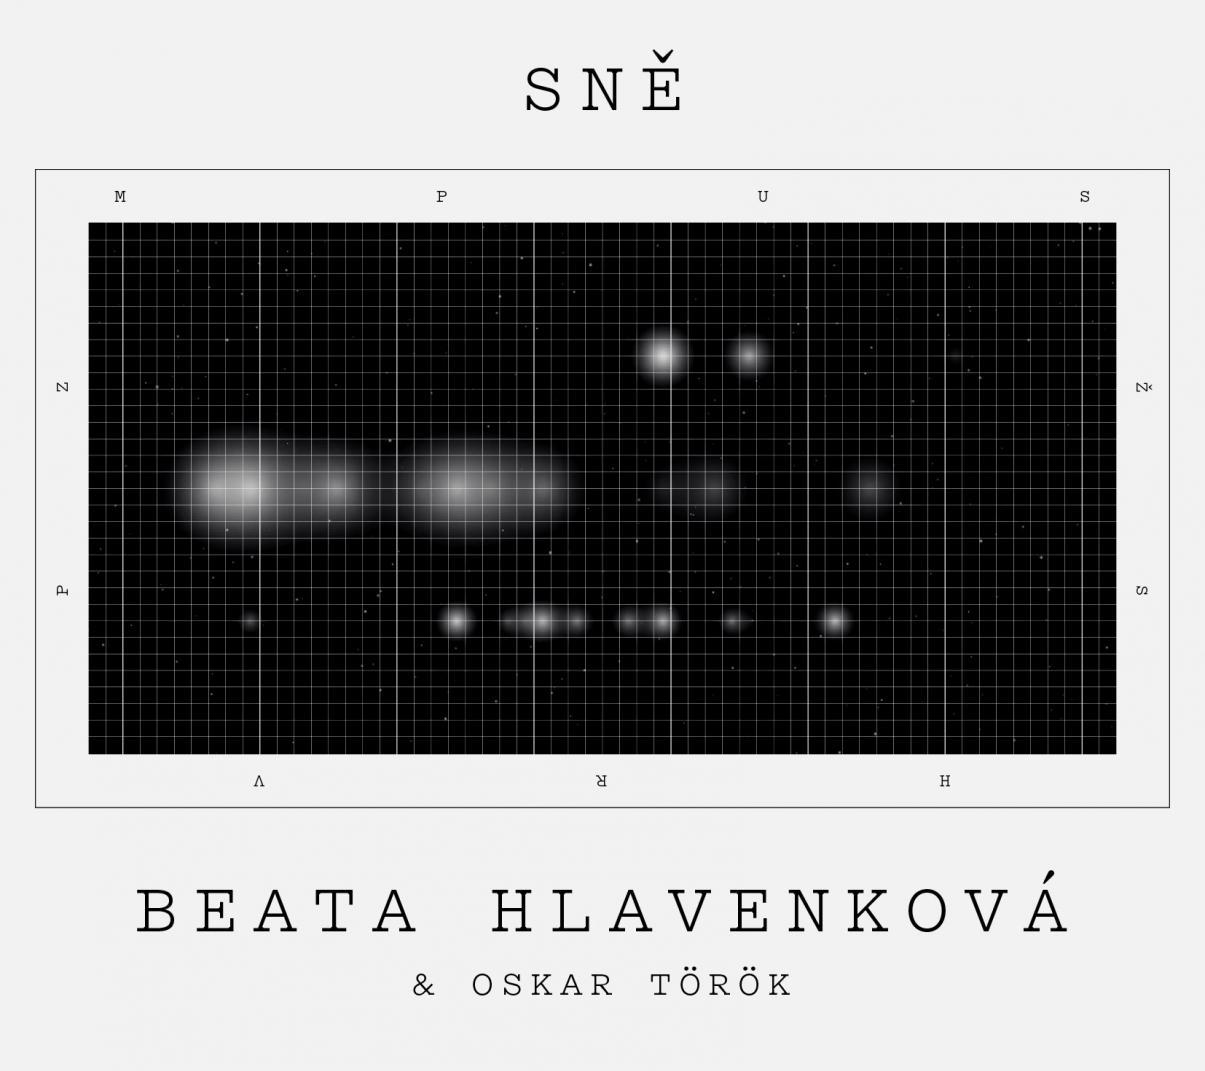 Beata Hlavenková: Sně